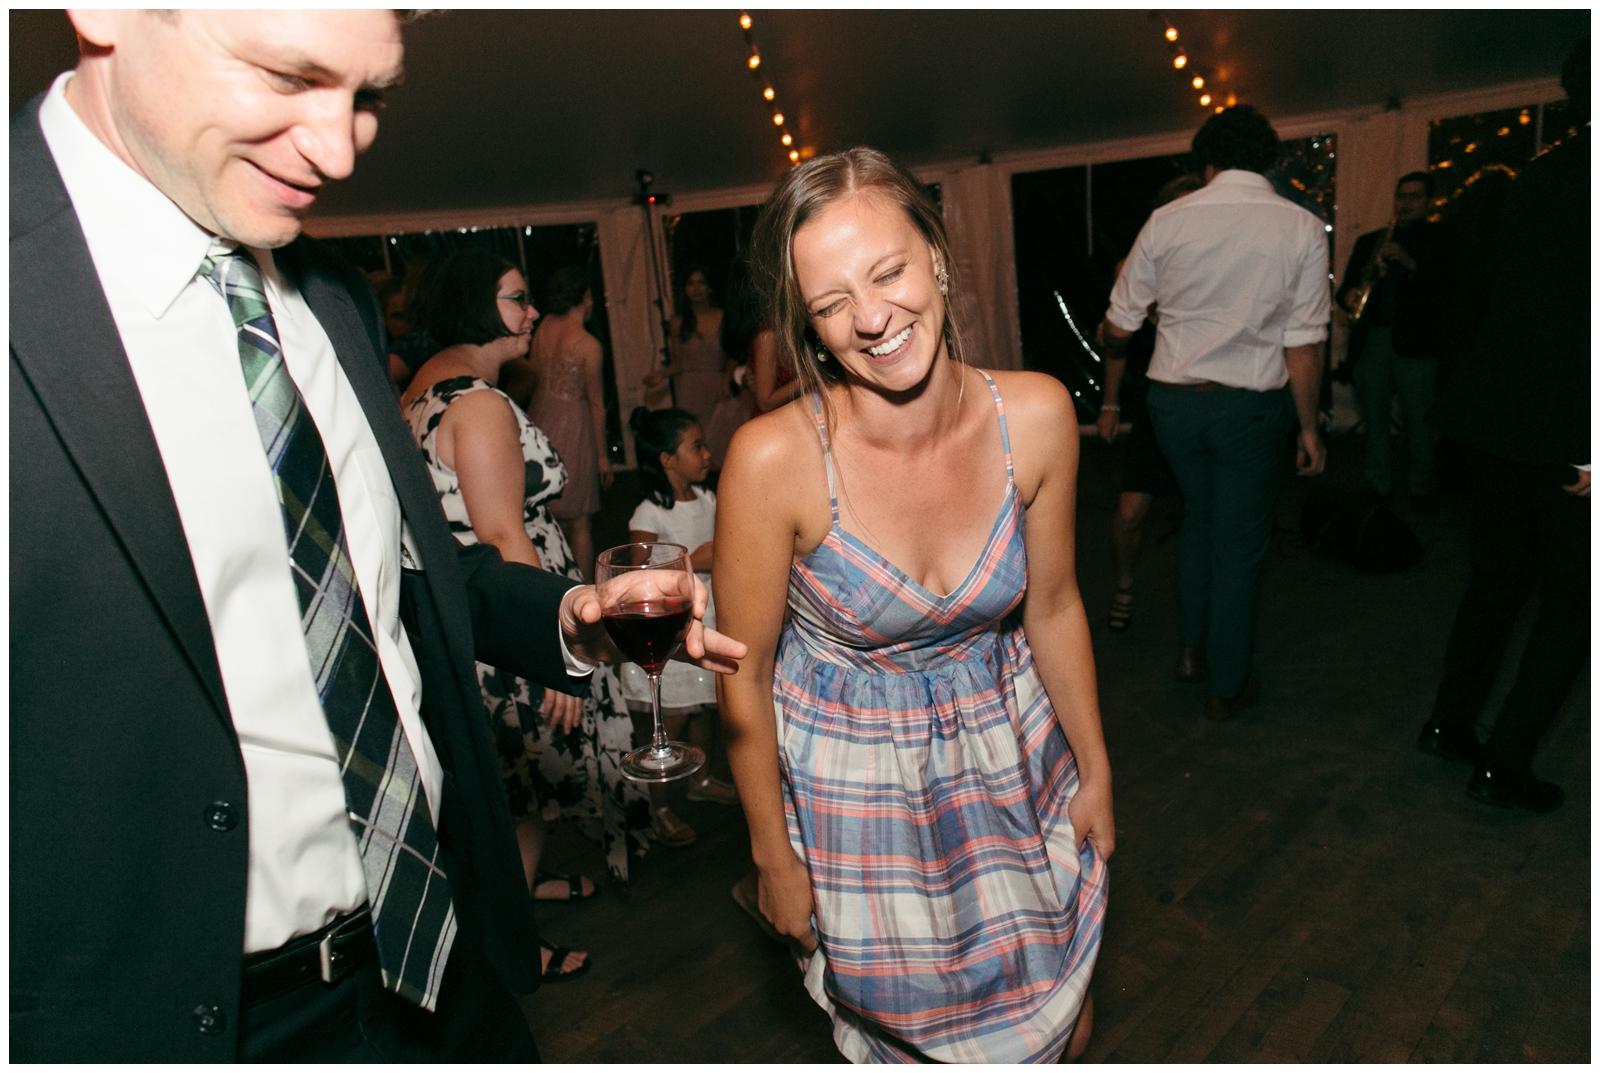 Moraine-Farm-wedding-Bailey-Q-Photo-Massachusetts-wedding-photpgrapher-144.jpg